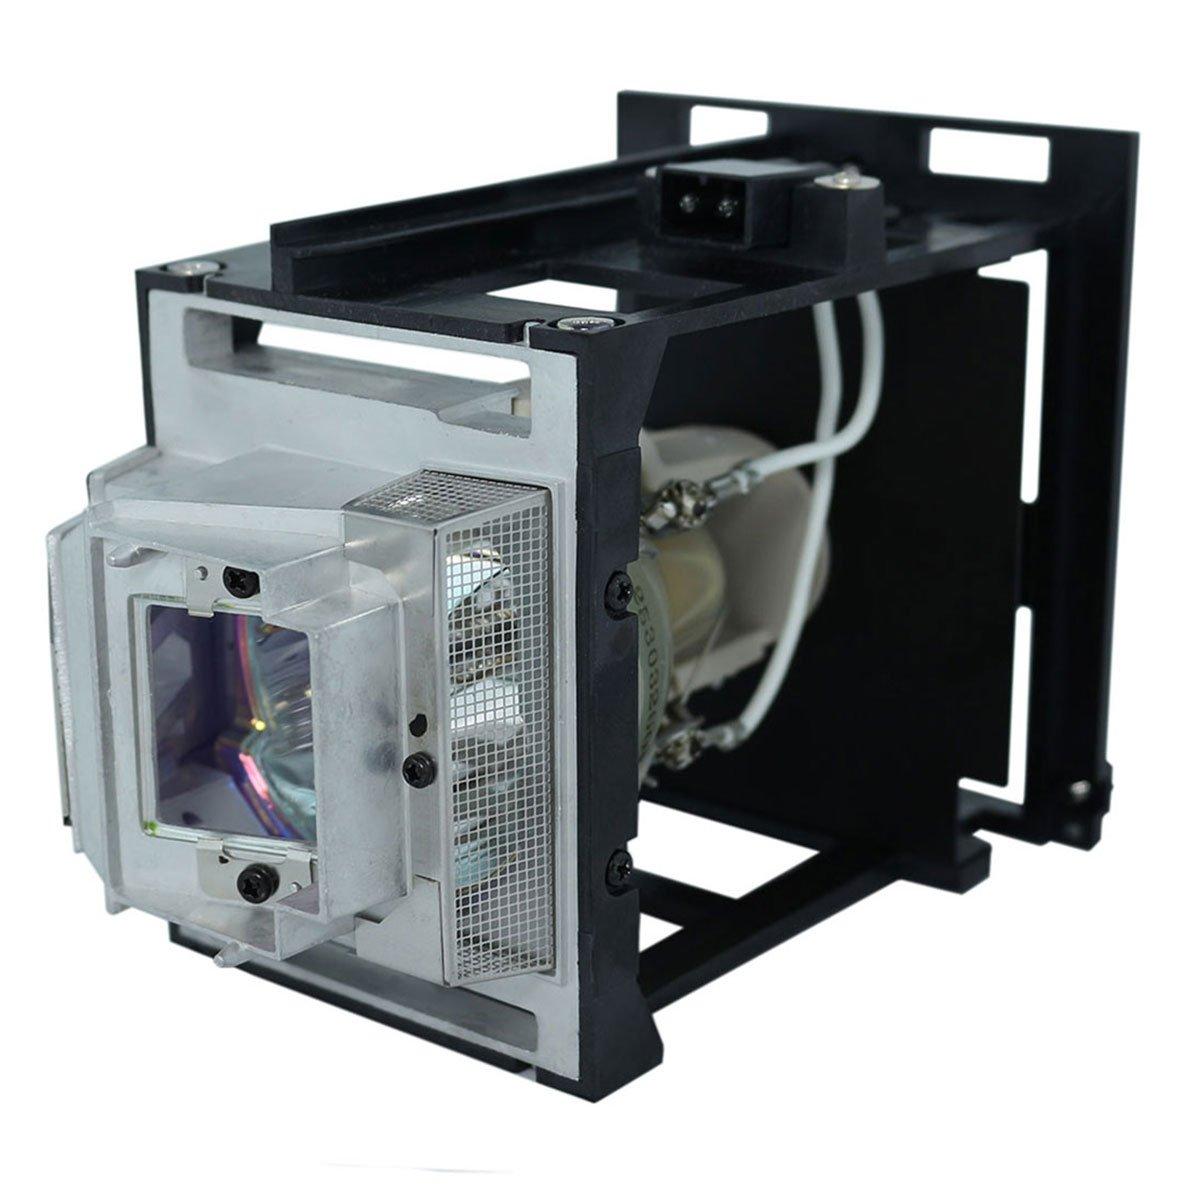 Lutema OEMプロジェクター交換用ランプ ハウジング/電球付き SmartBoard UX80用 Platinum (Brighter/Durable) B07KTKPTD6 Lamp with Housing Platinum (Brighter/Durable)